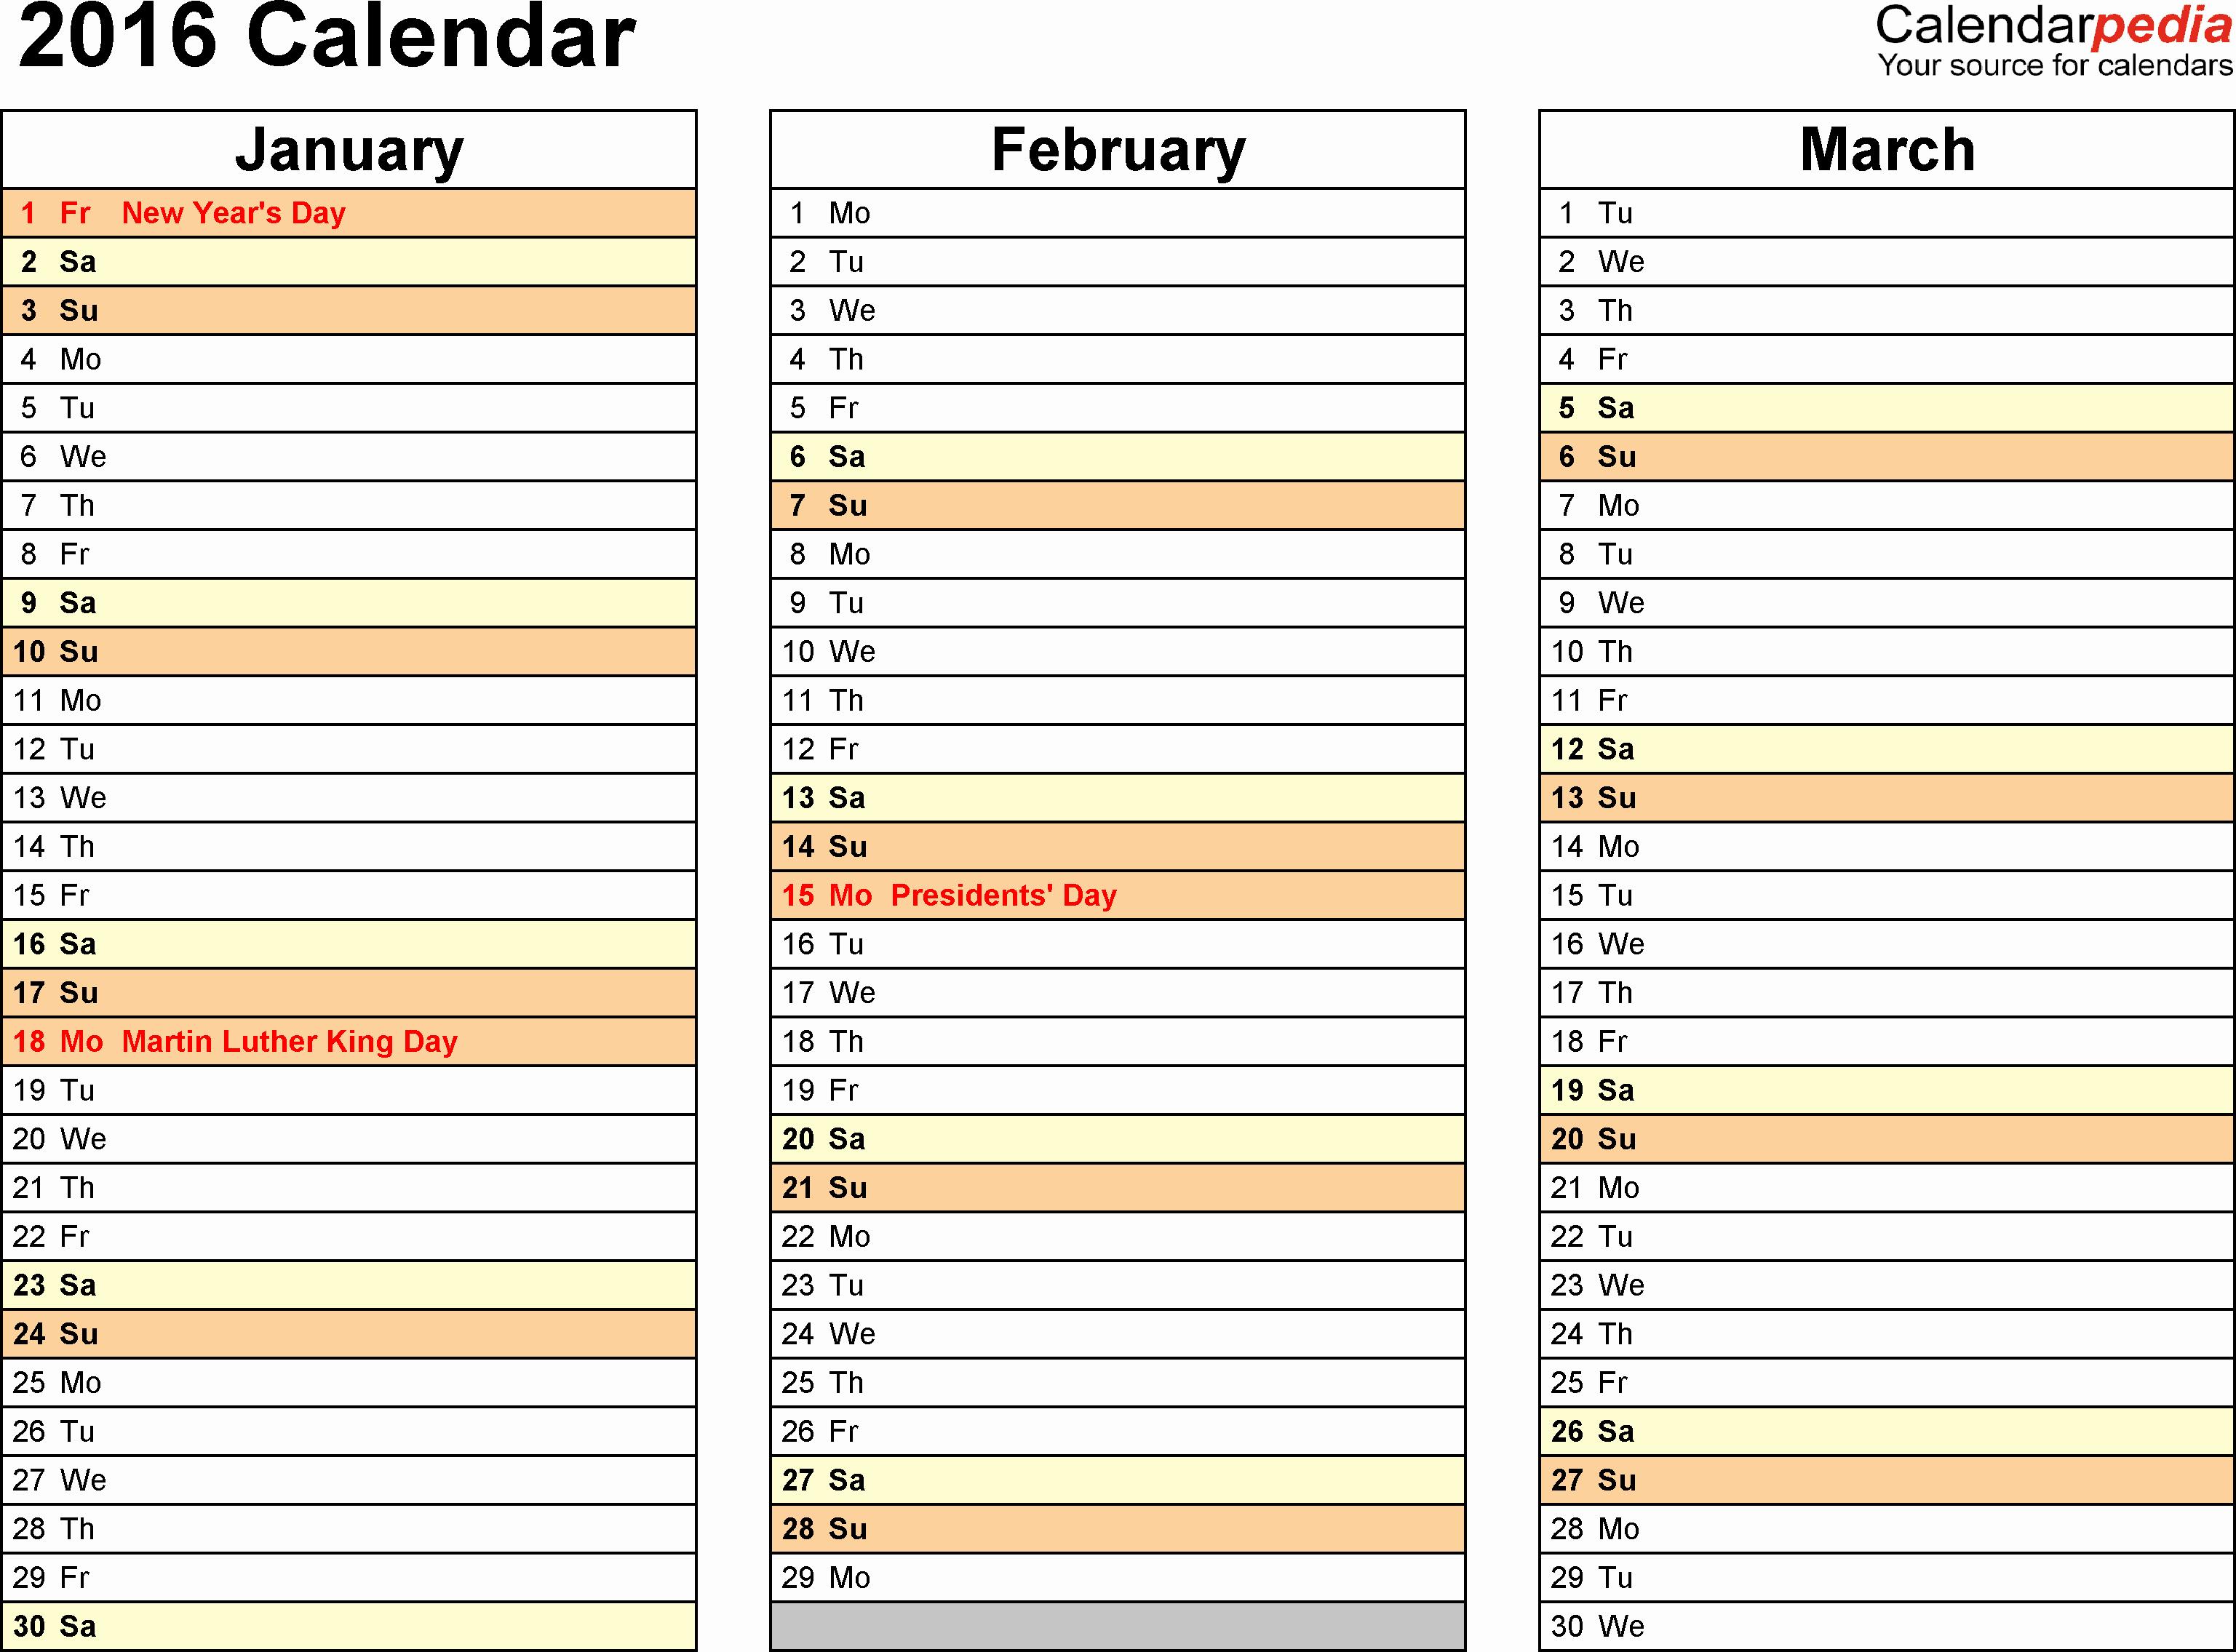 3 Month Calendar Printable 2016 Luxury 3 Month 2016 Calendar Printable Free for Word